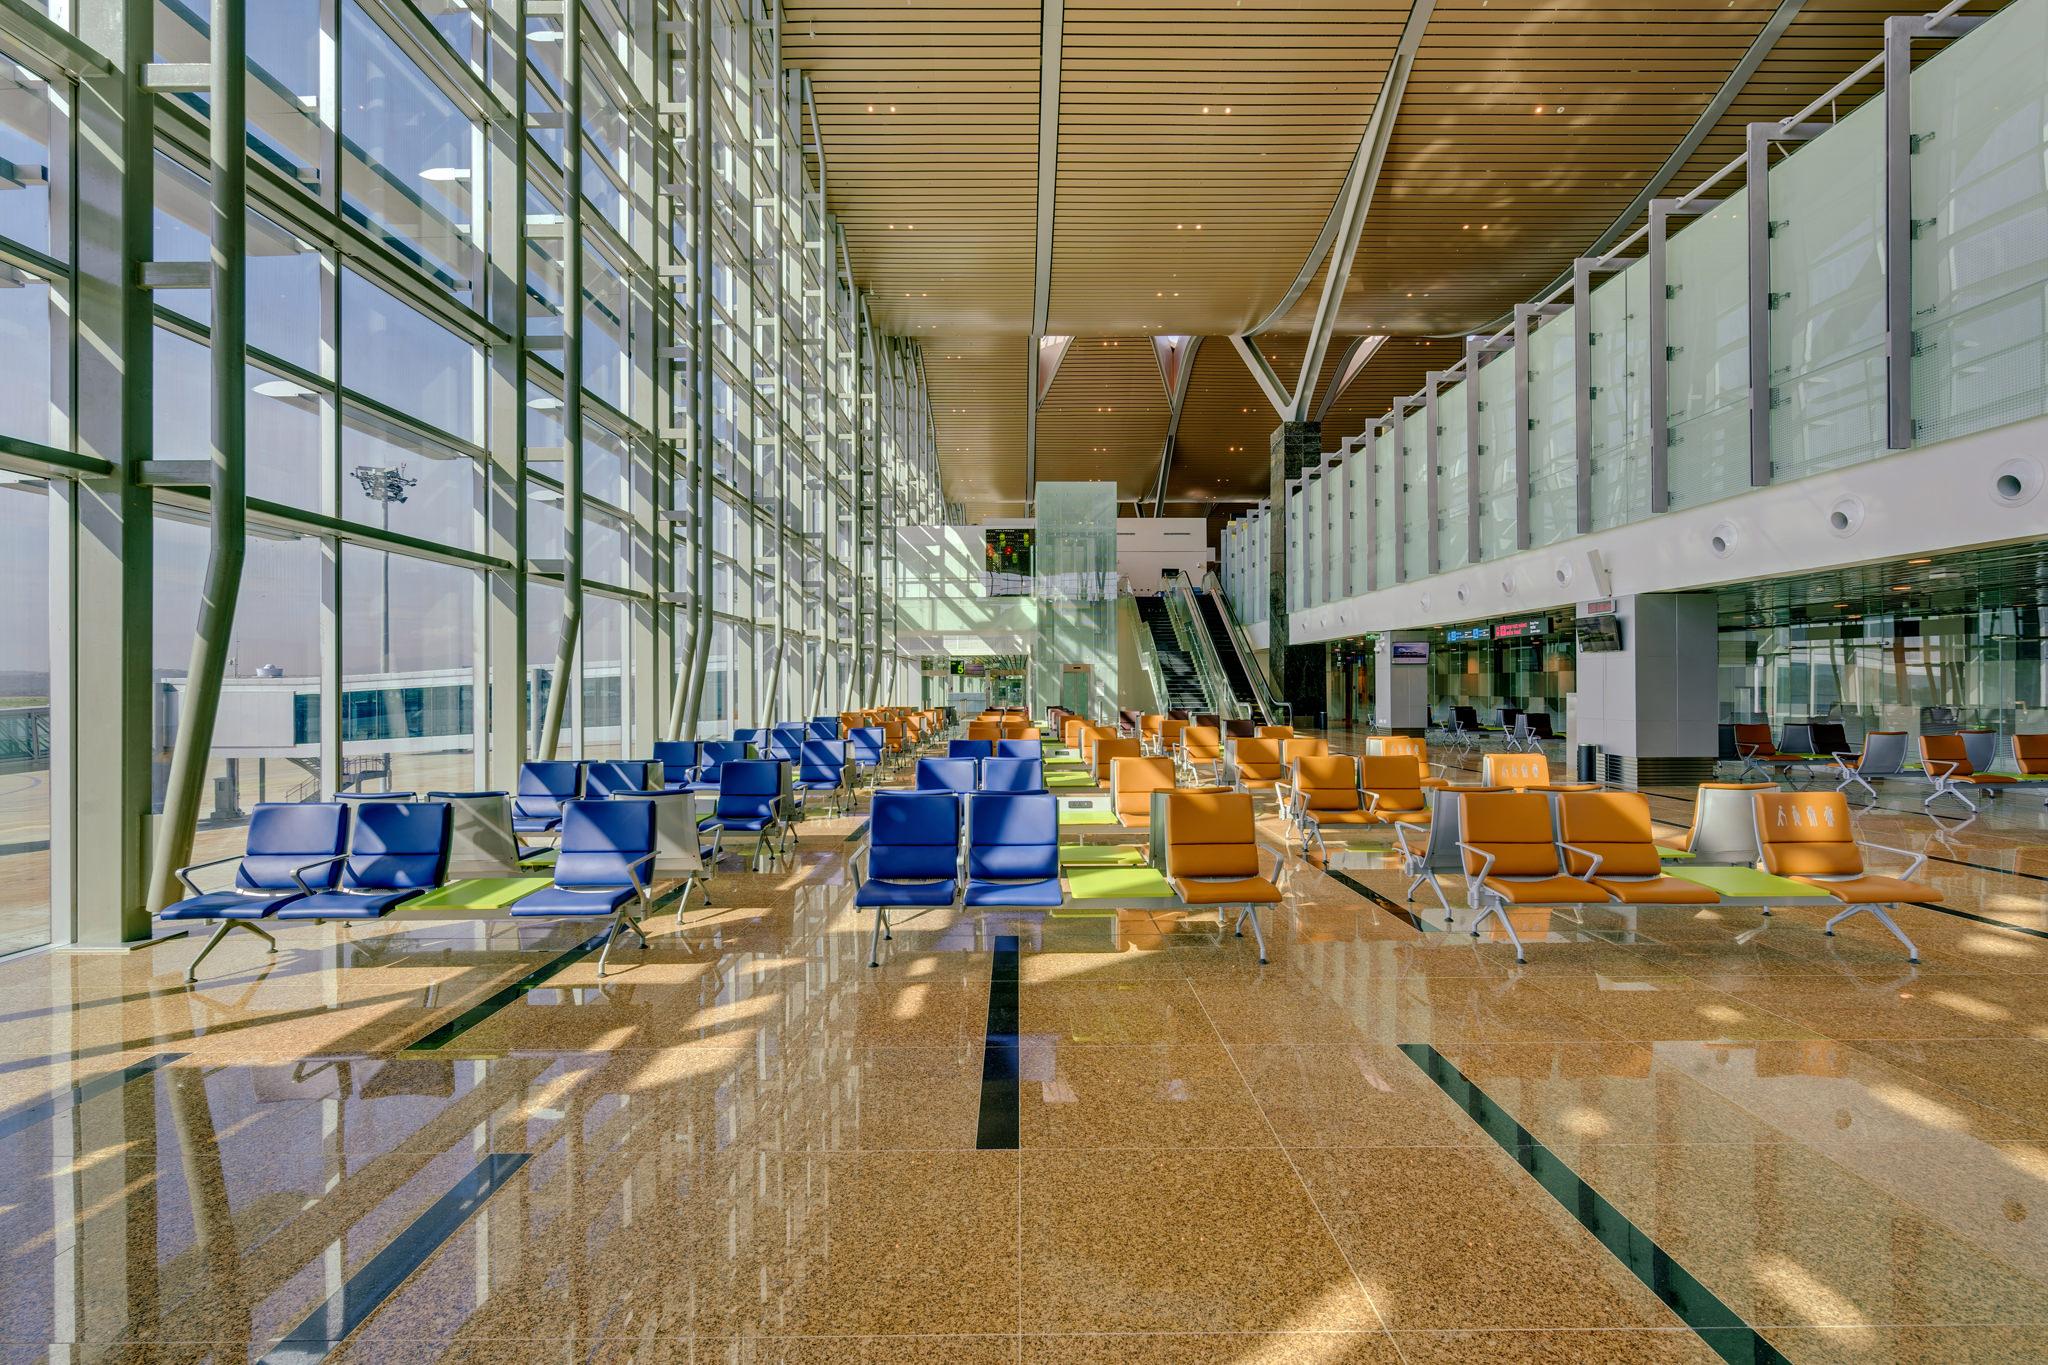 20180626 - Cam Ranh Airport - Architecture - 0199.jpg